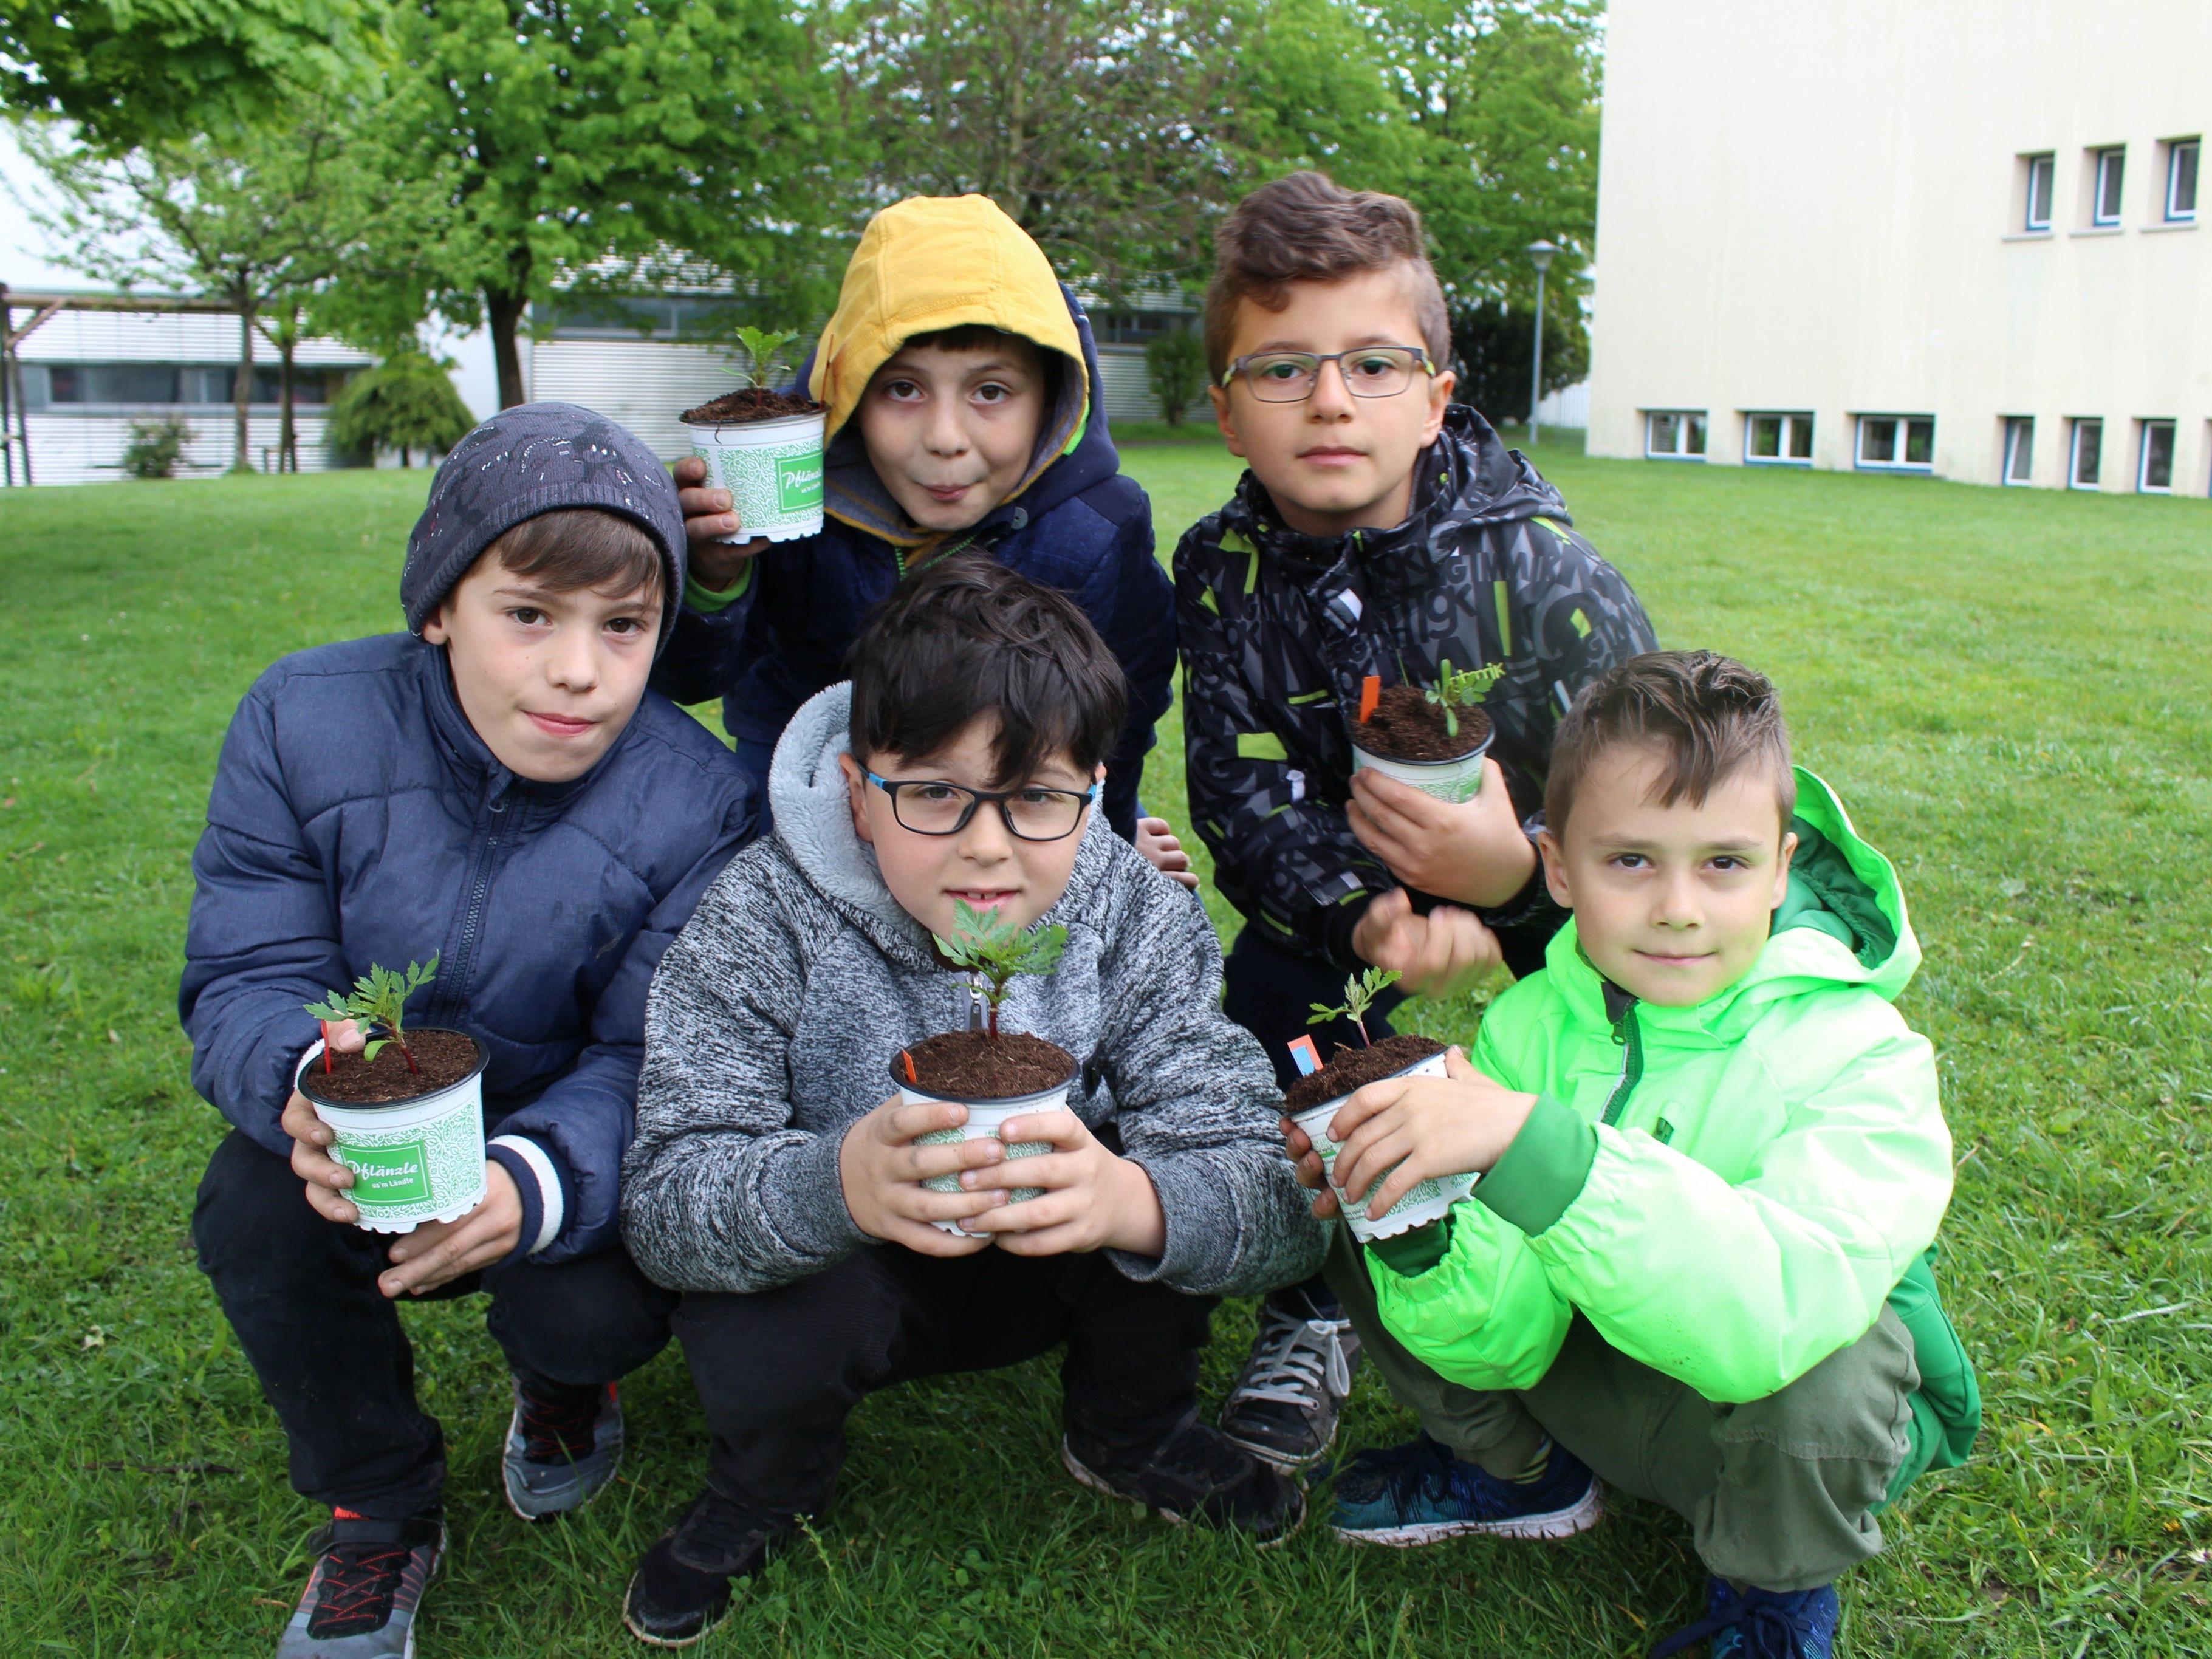 Gärtnern macht glücklich: David, Hasan, Öner, Jon und Berkay